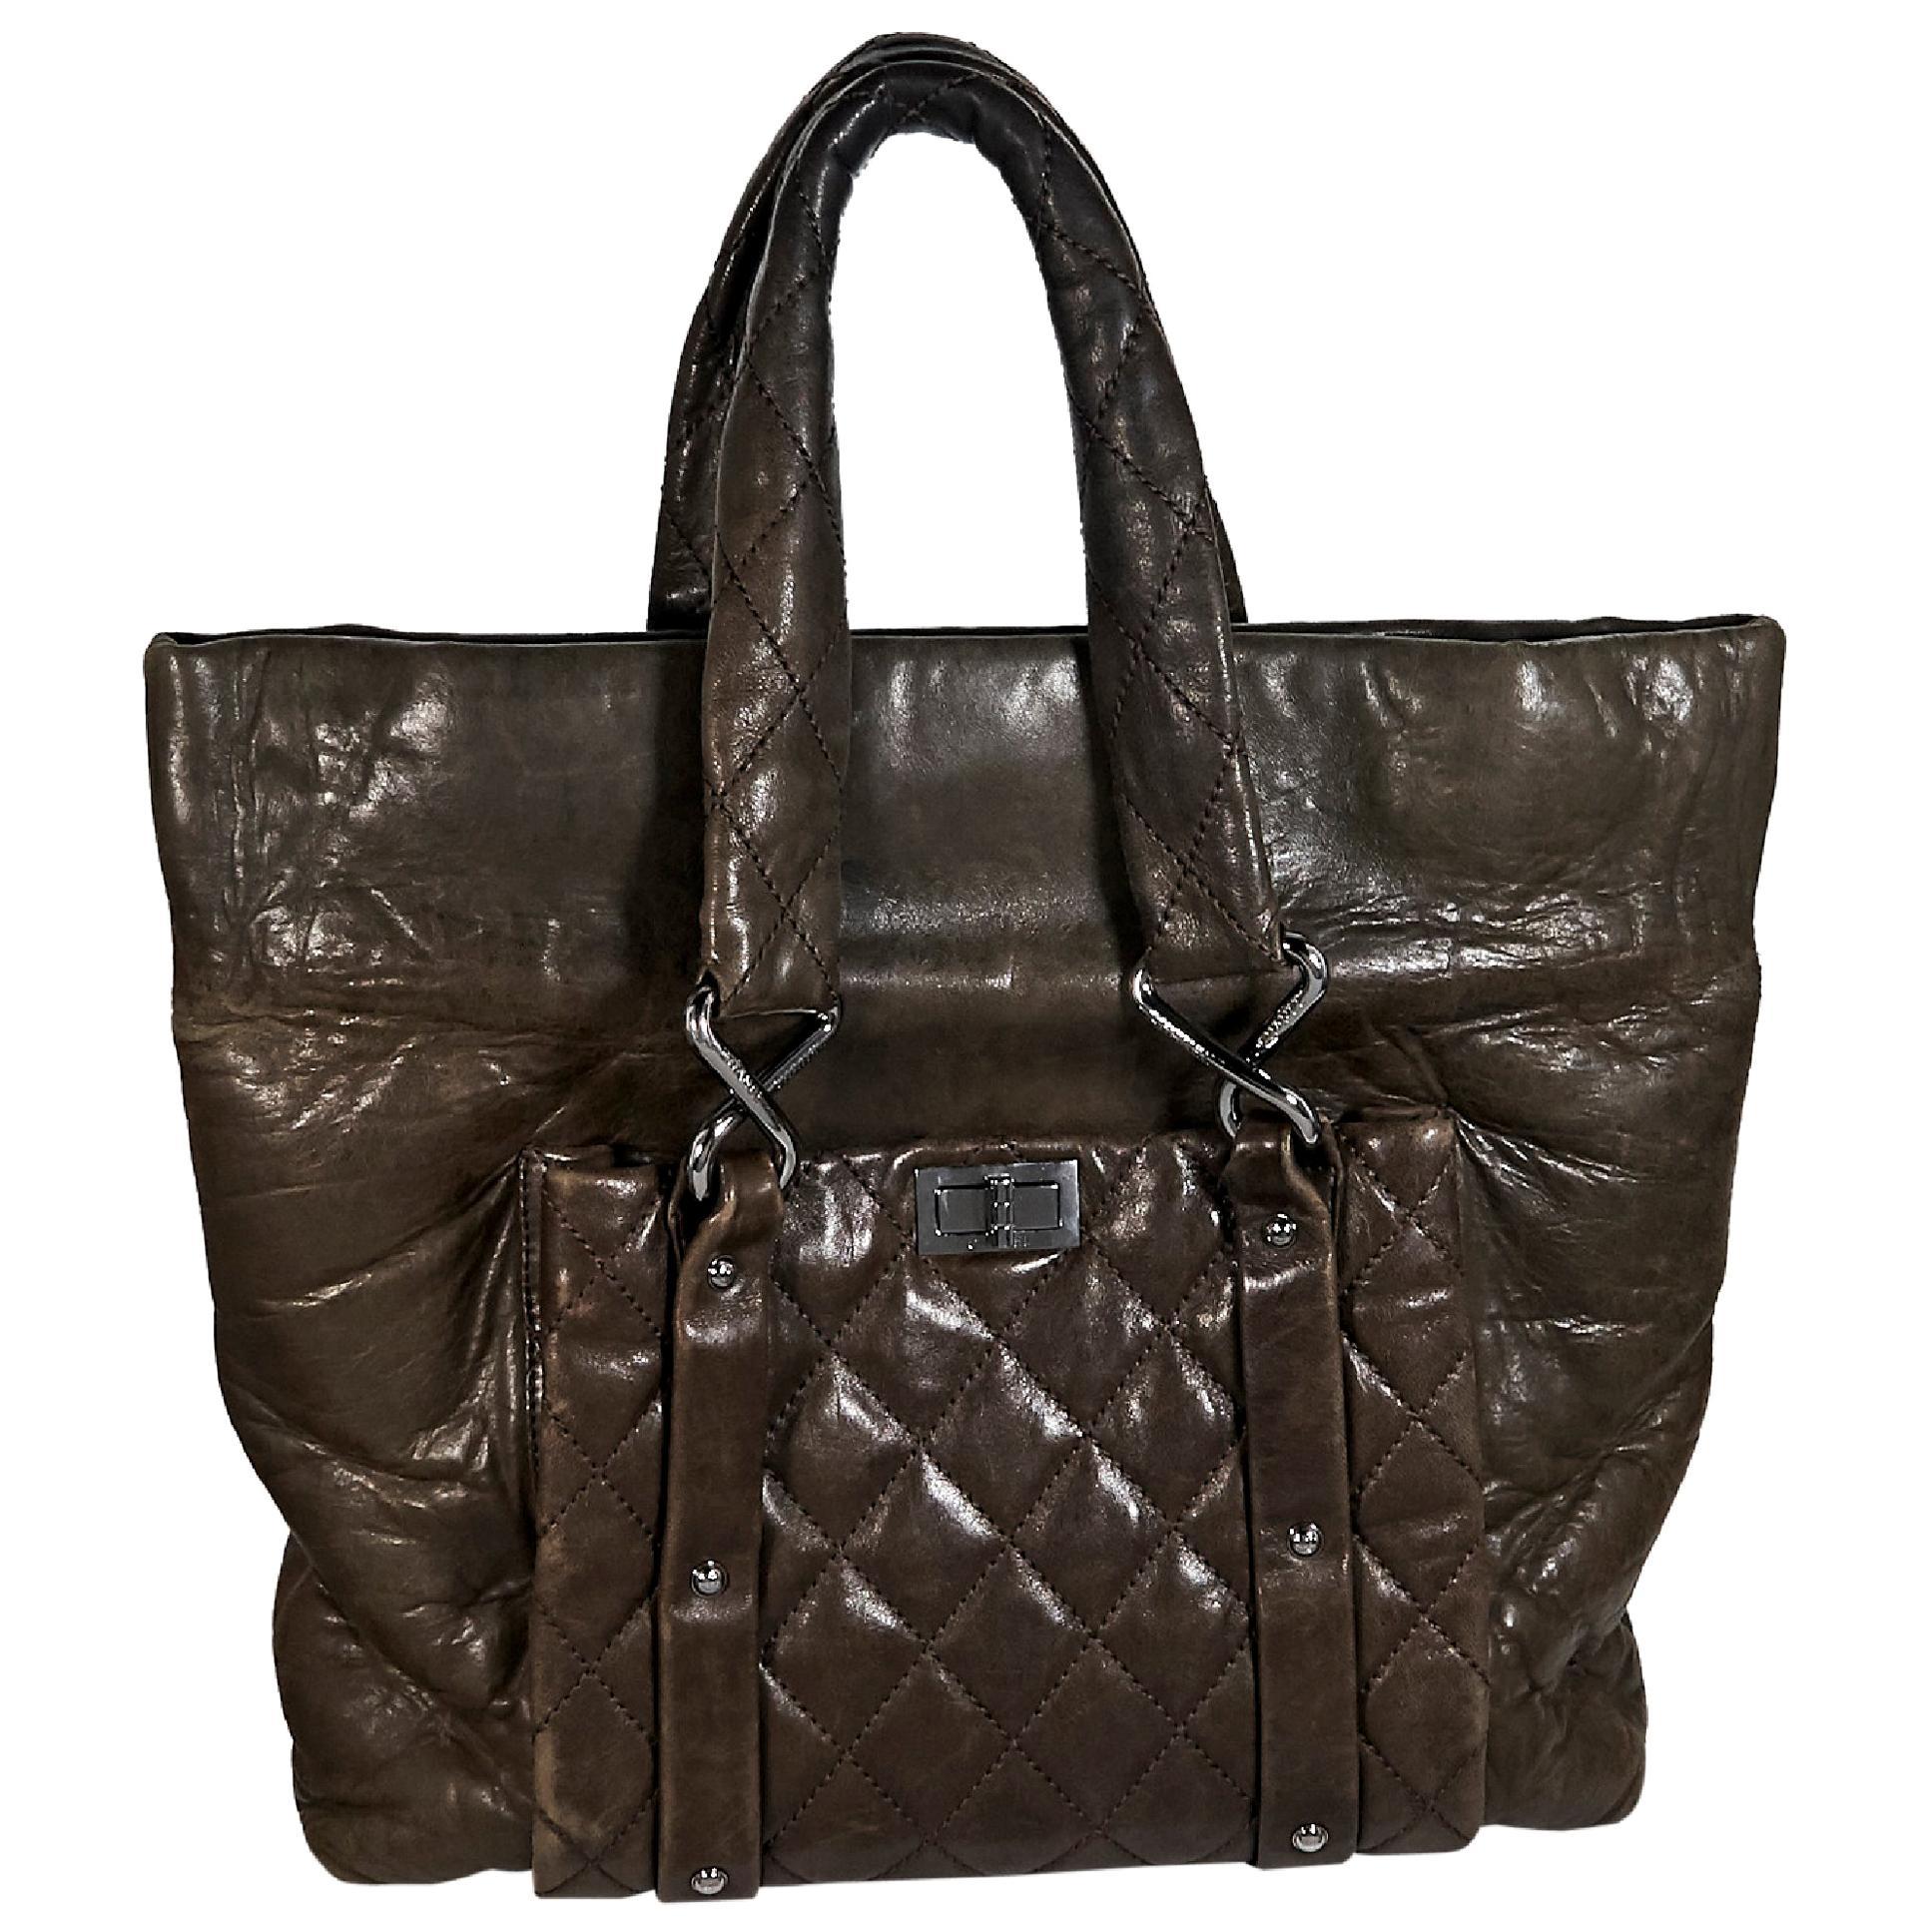 1b8633ddd4eaf0 Brown Chanel Leather Tote Bag For Sale at 1stdibs